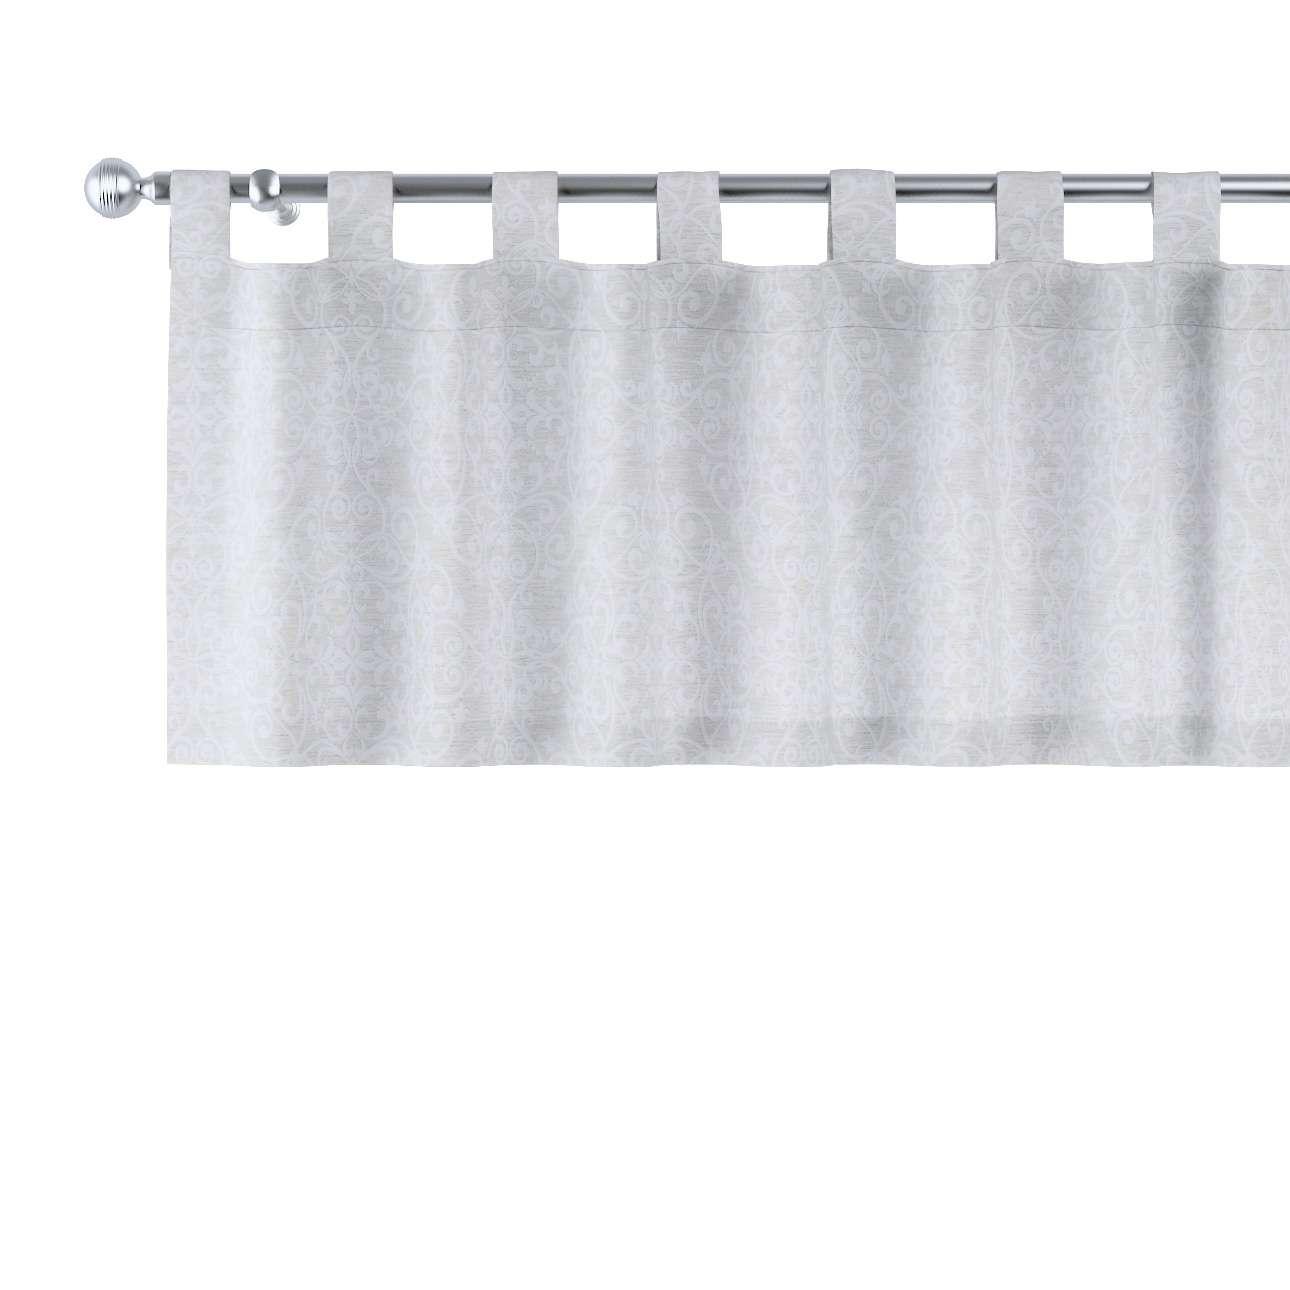 Lambrekin na szelkach 130x40cm w kolekcji Venice, tkanina: 140-49